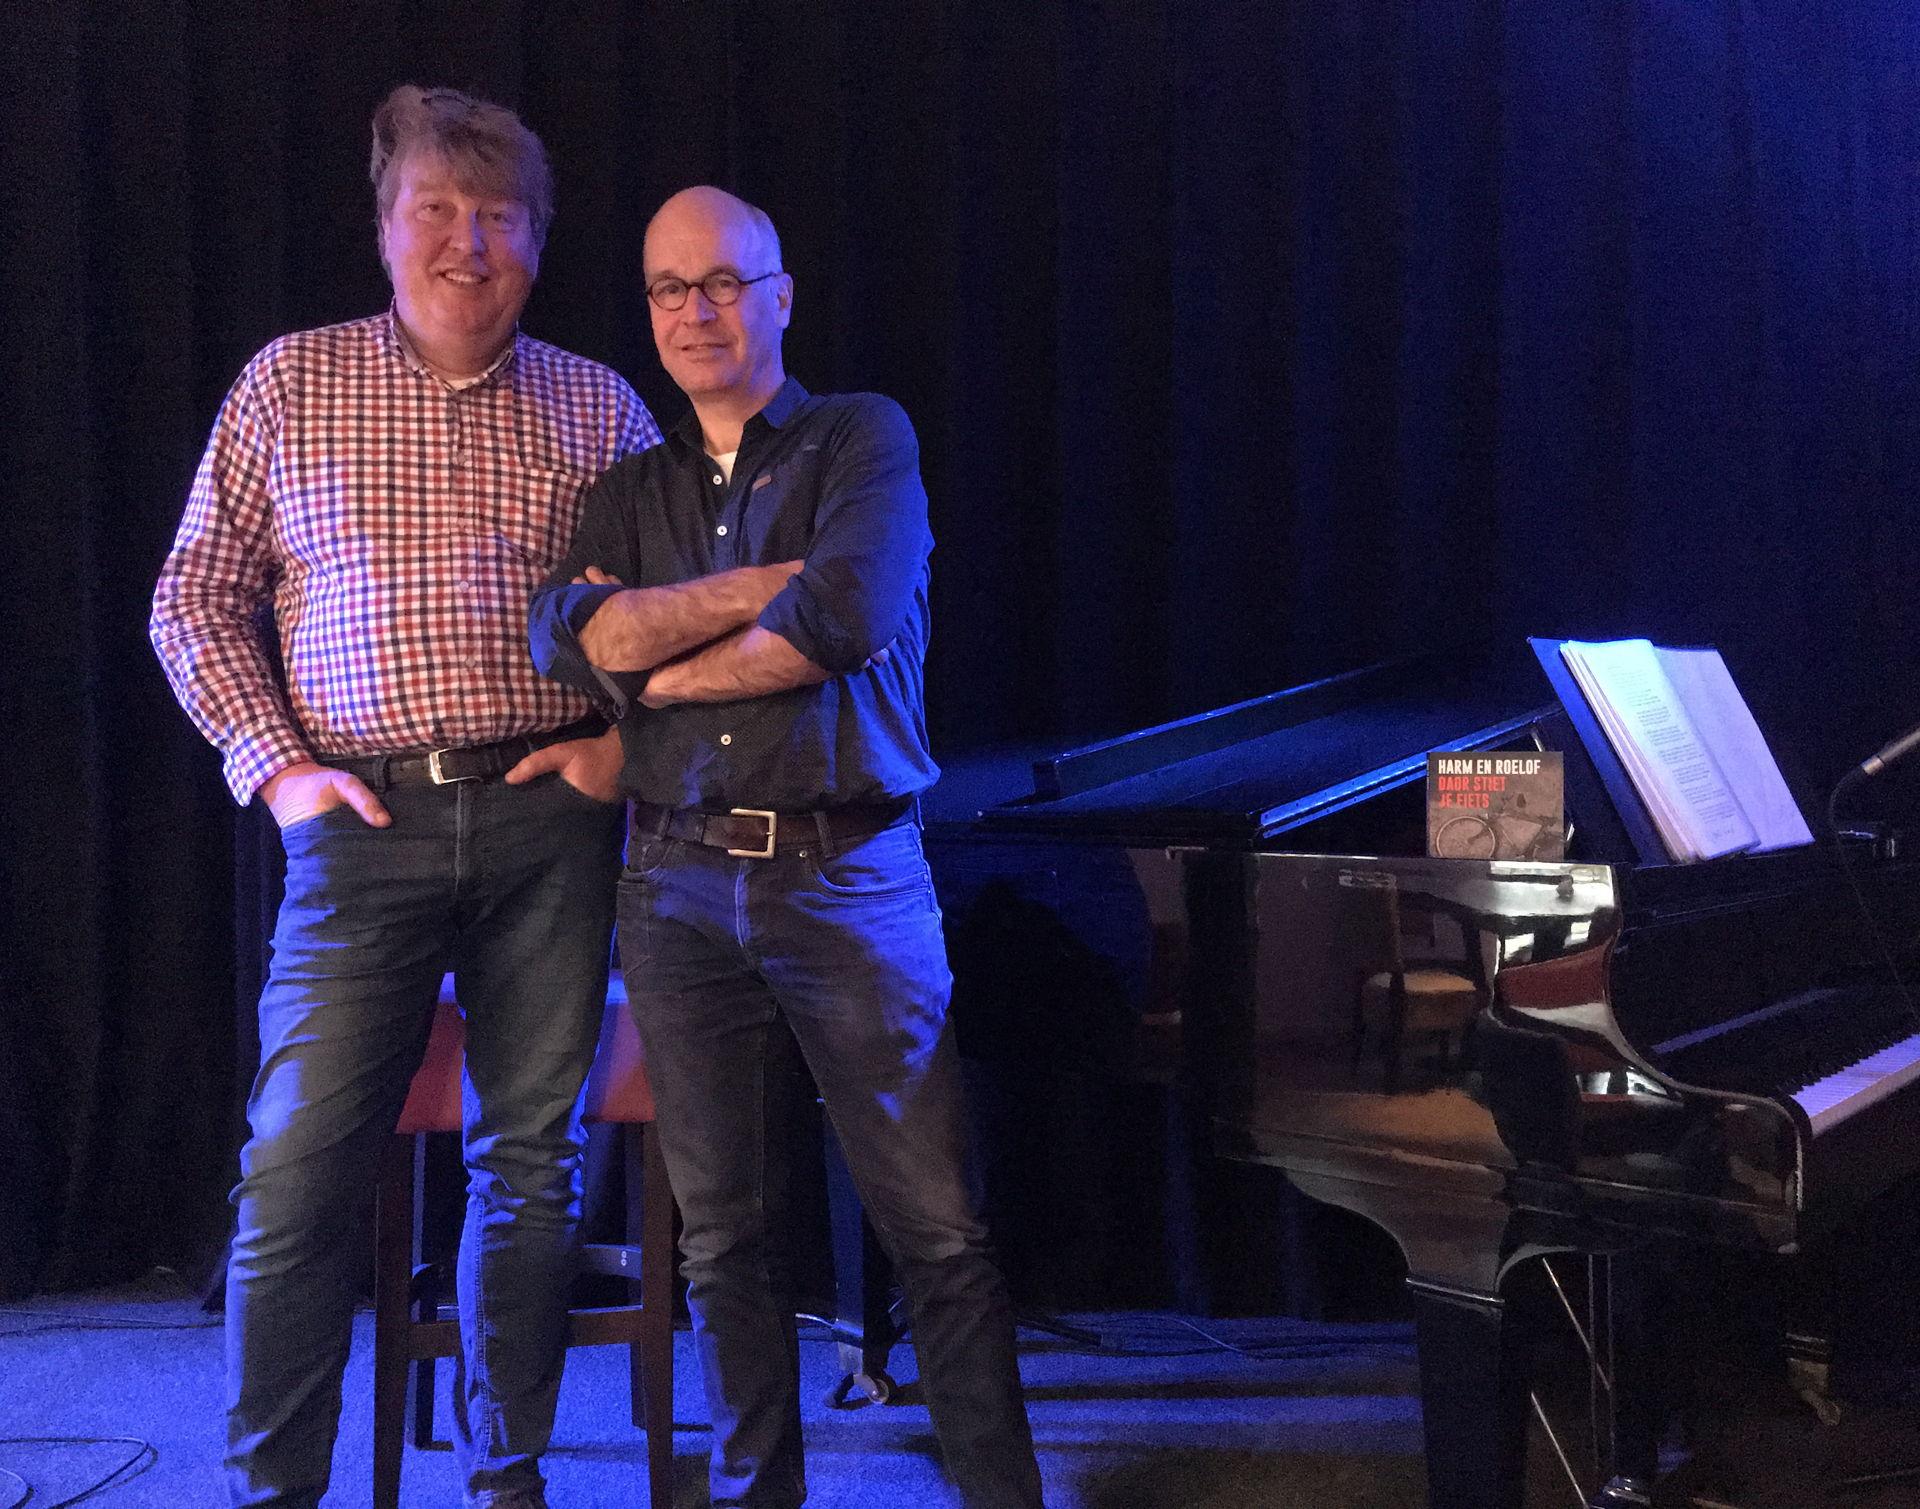 Harm en Roelof speelden in 2019 Nagelholt en zoepenbrei